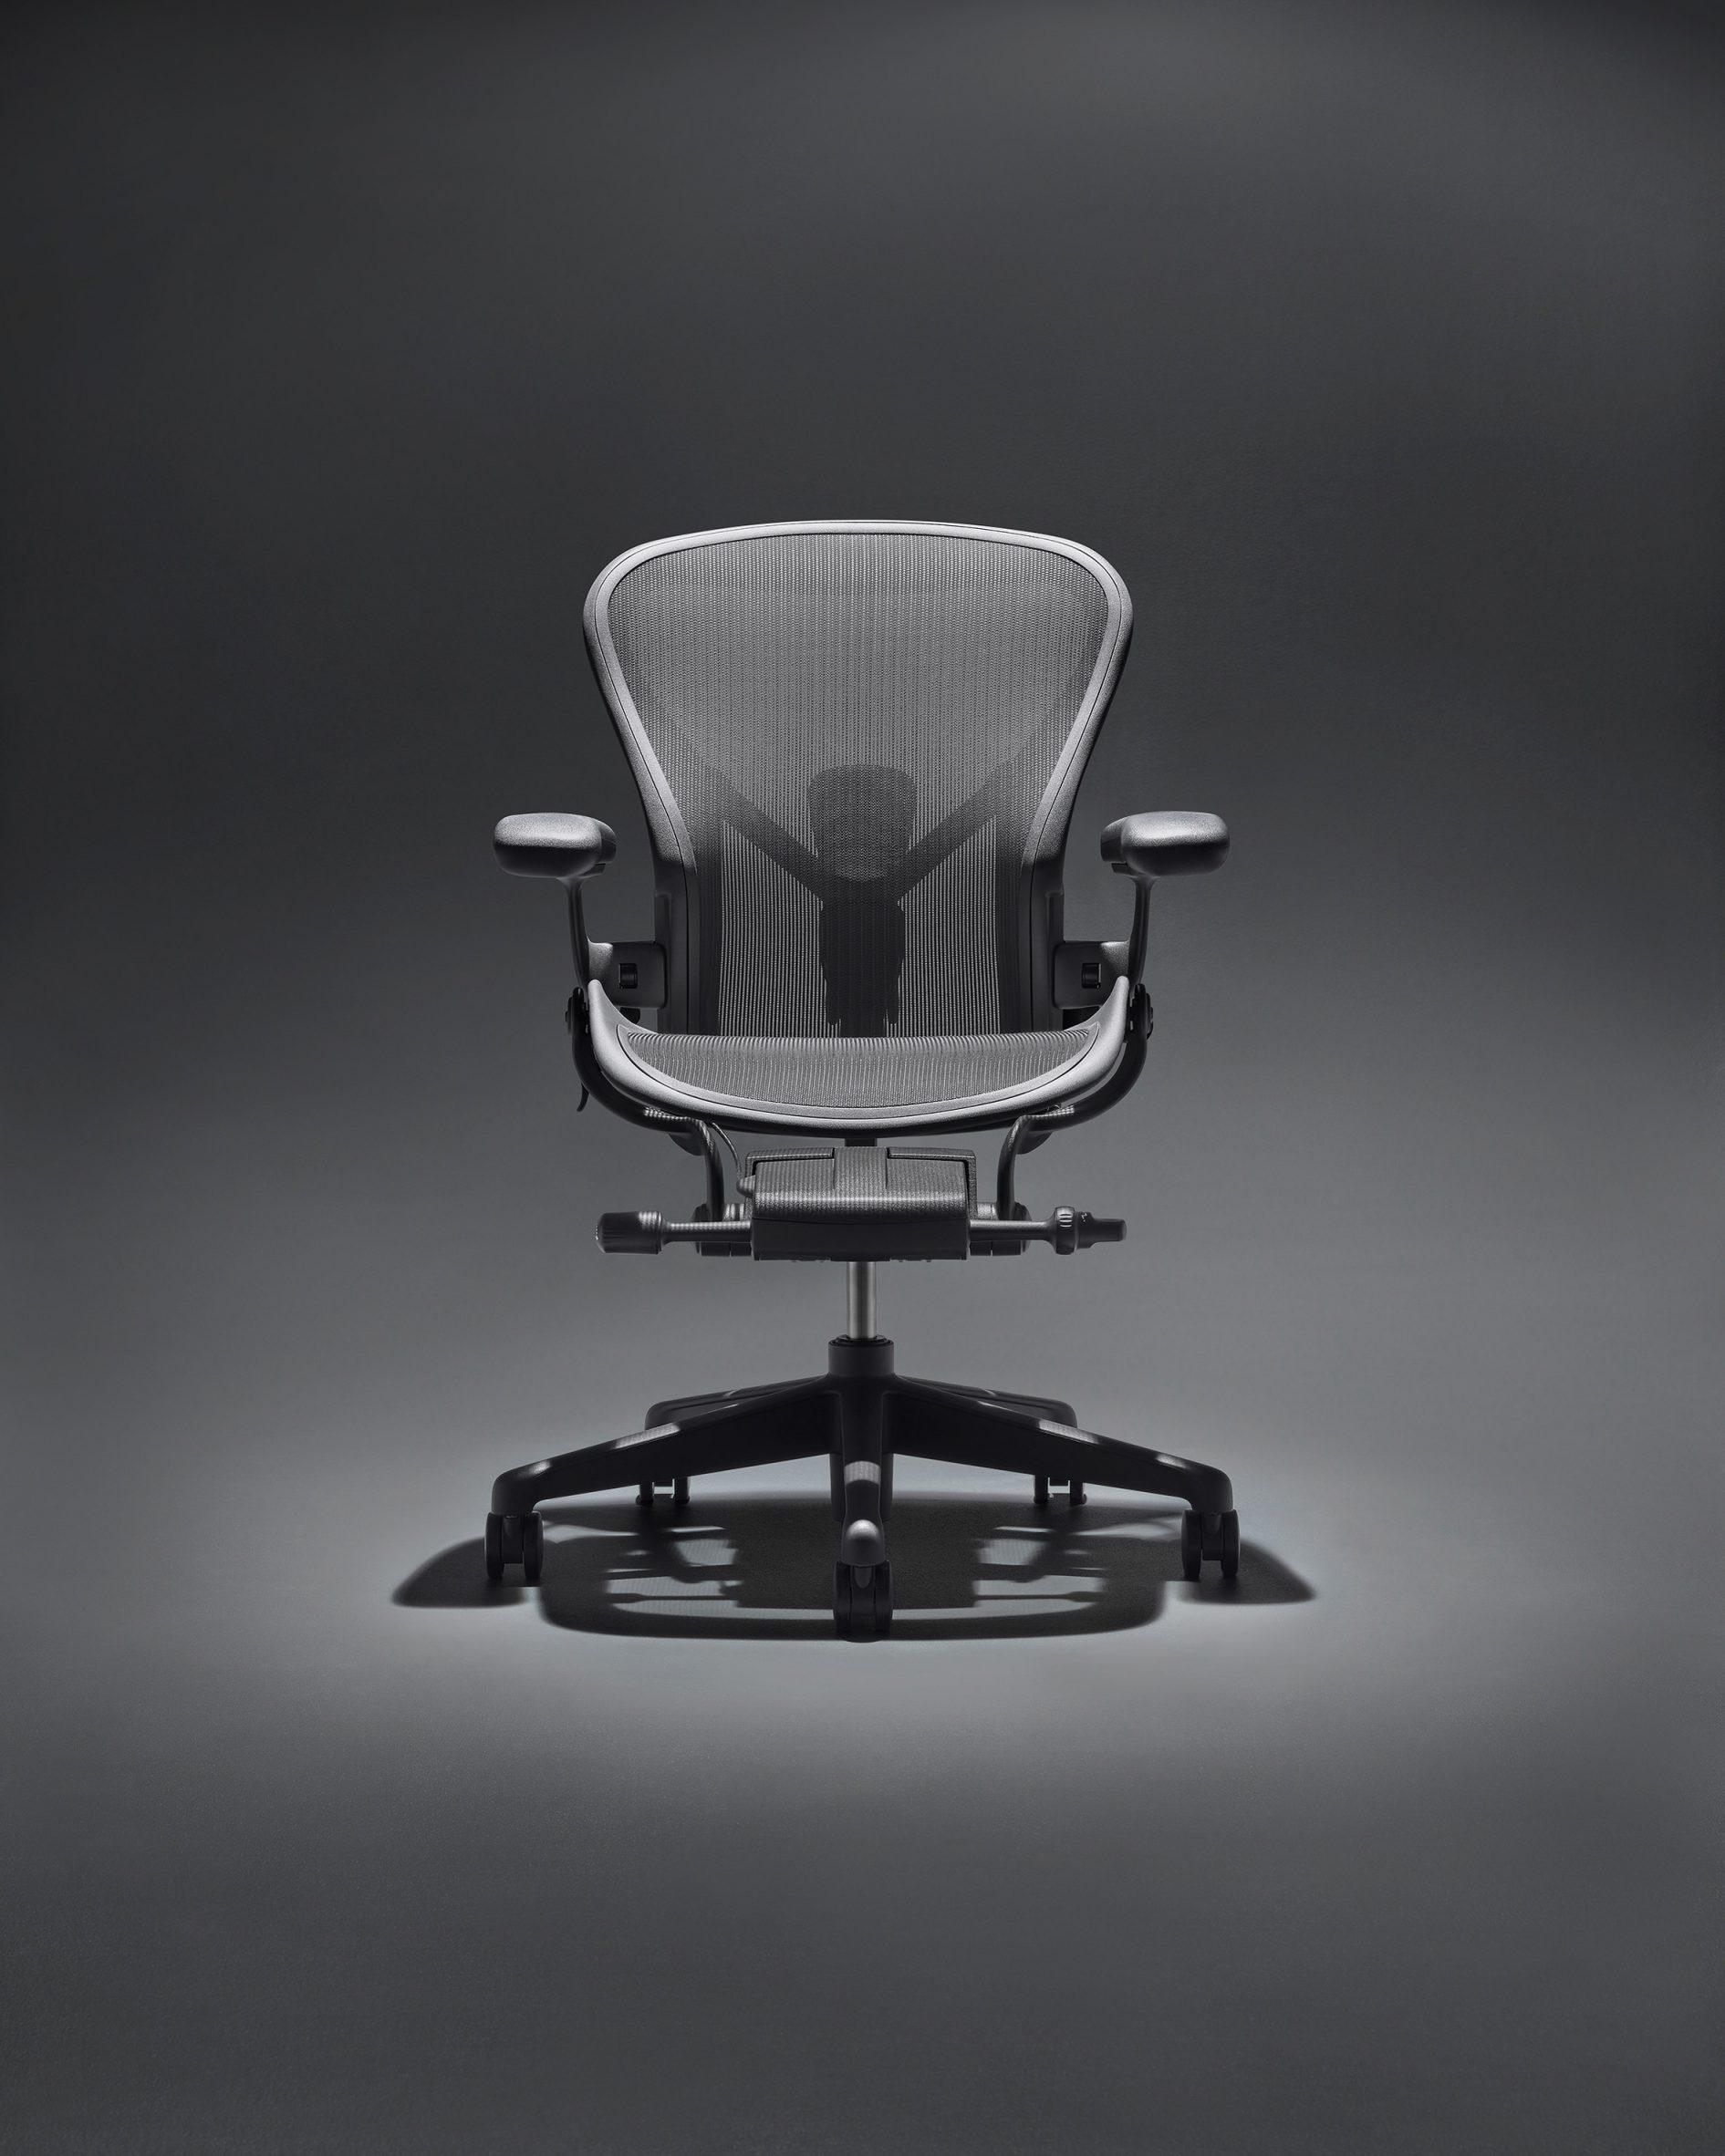 A black Aeron Onyx chair by Herman Miller